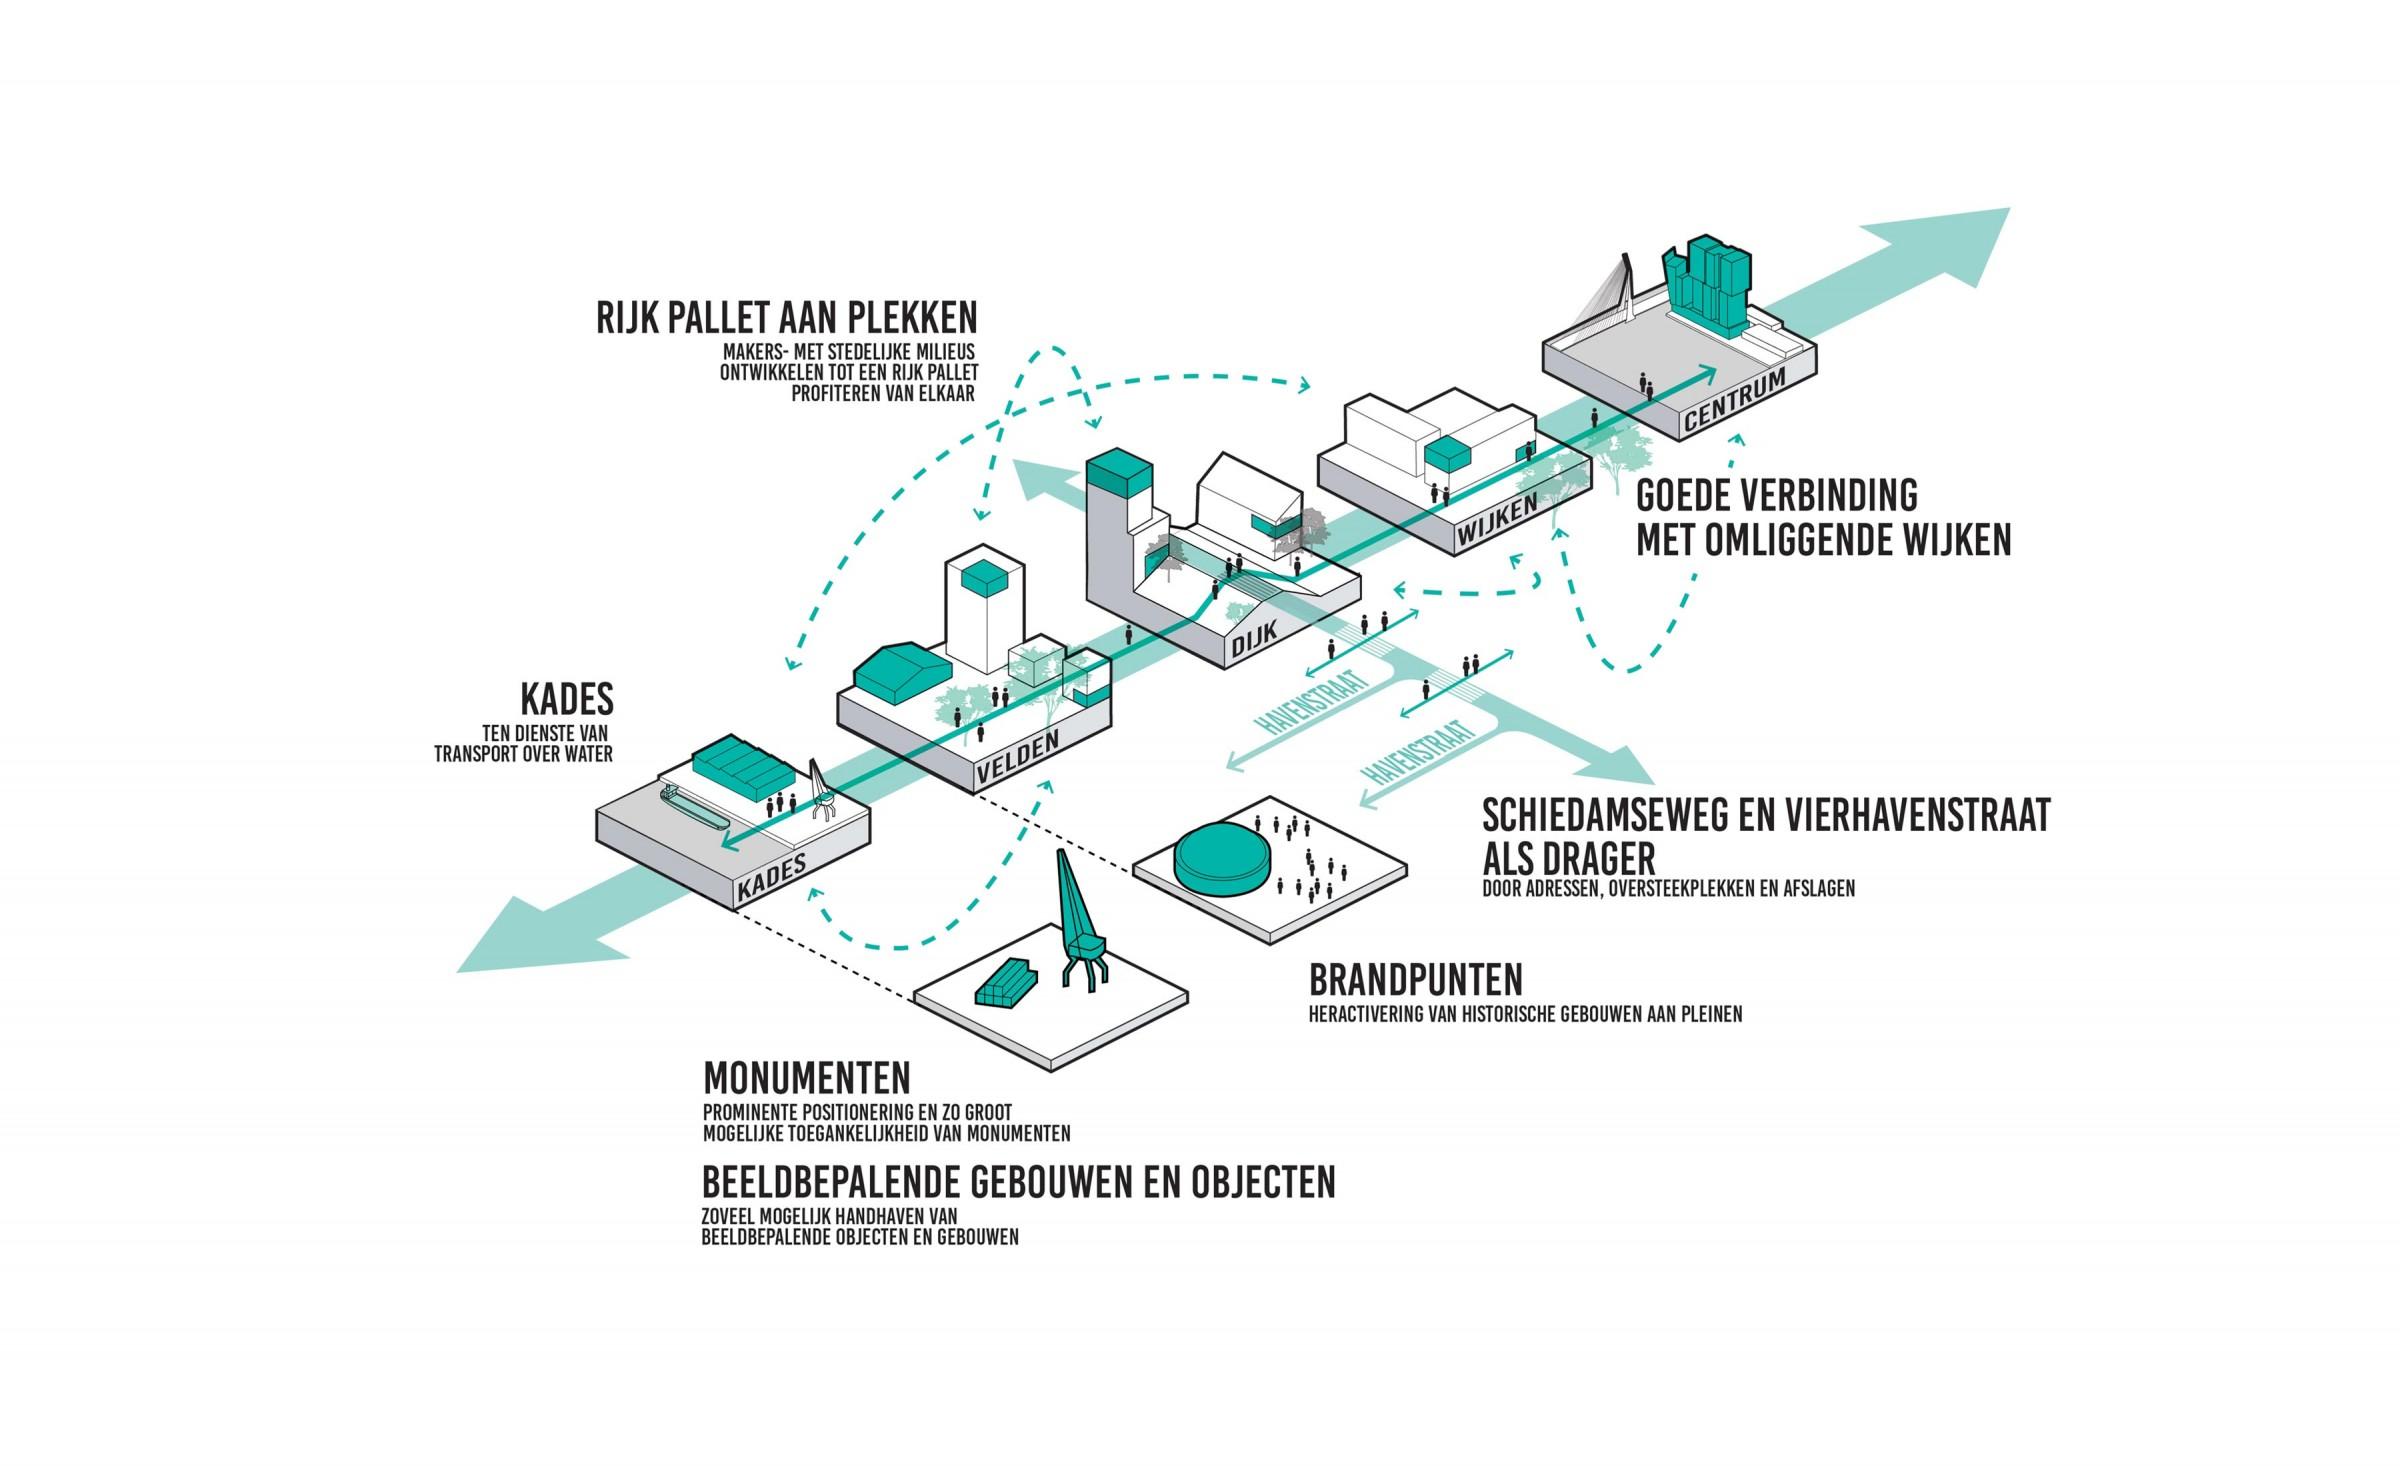 <p>M4H Bouwt voort op indentiteit en kwaliteit &#8211;  M4H &#8211; DELVA Landscape Architects   Urbanism</p>